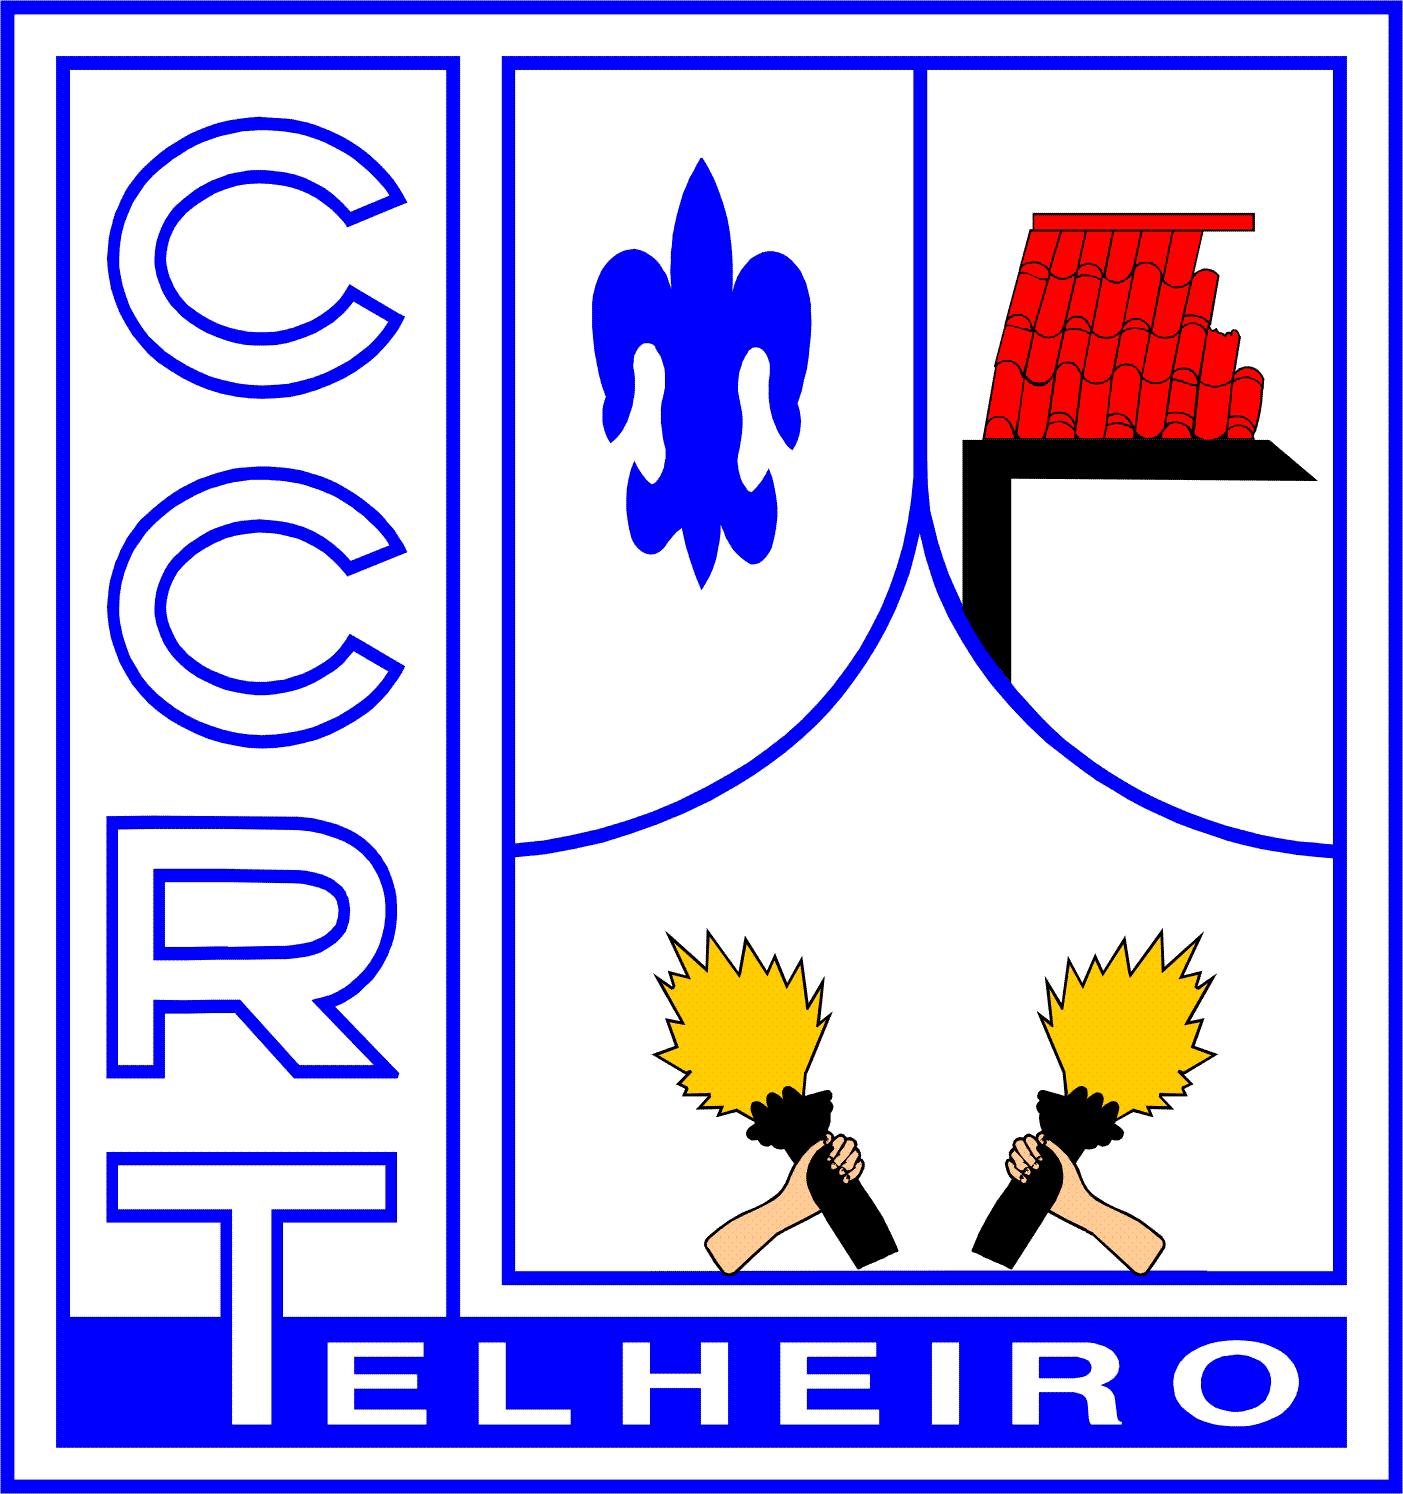 CCR Telheiro Juniores D